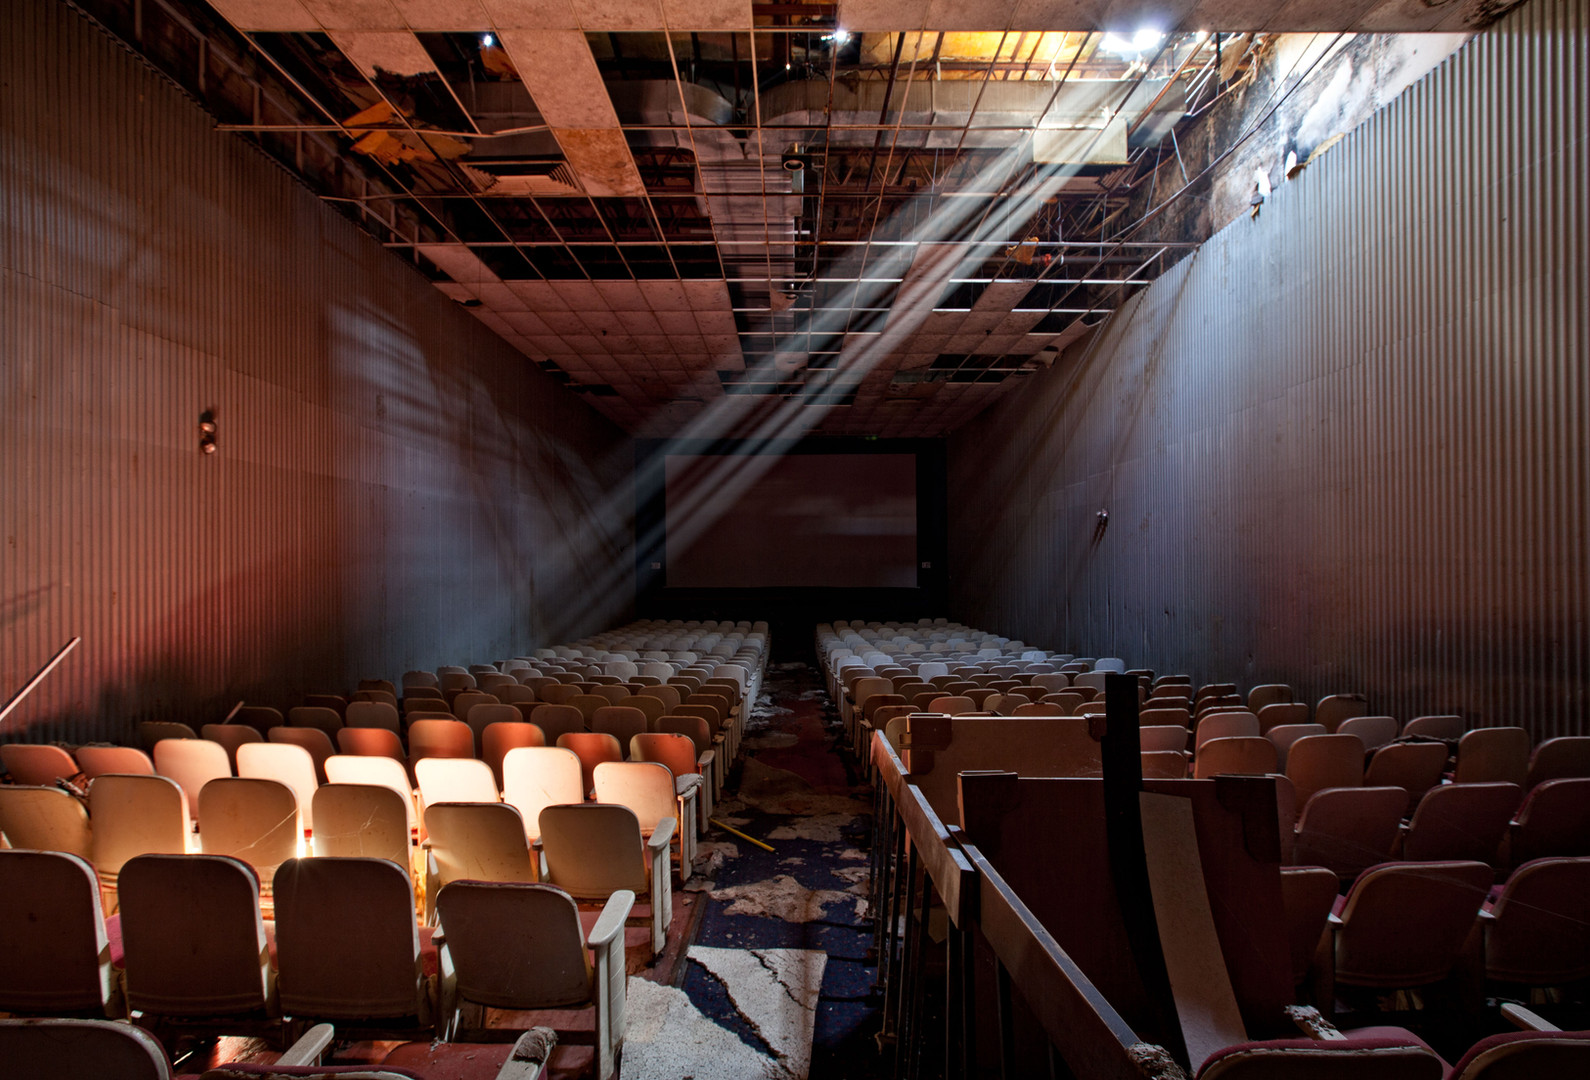 General Cinema Corp. Theater